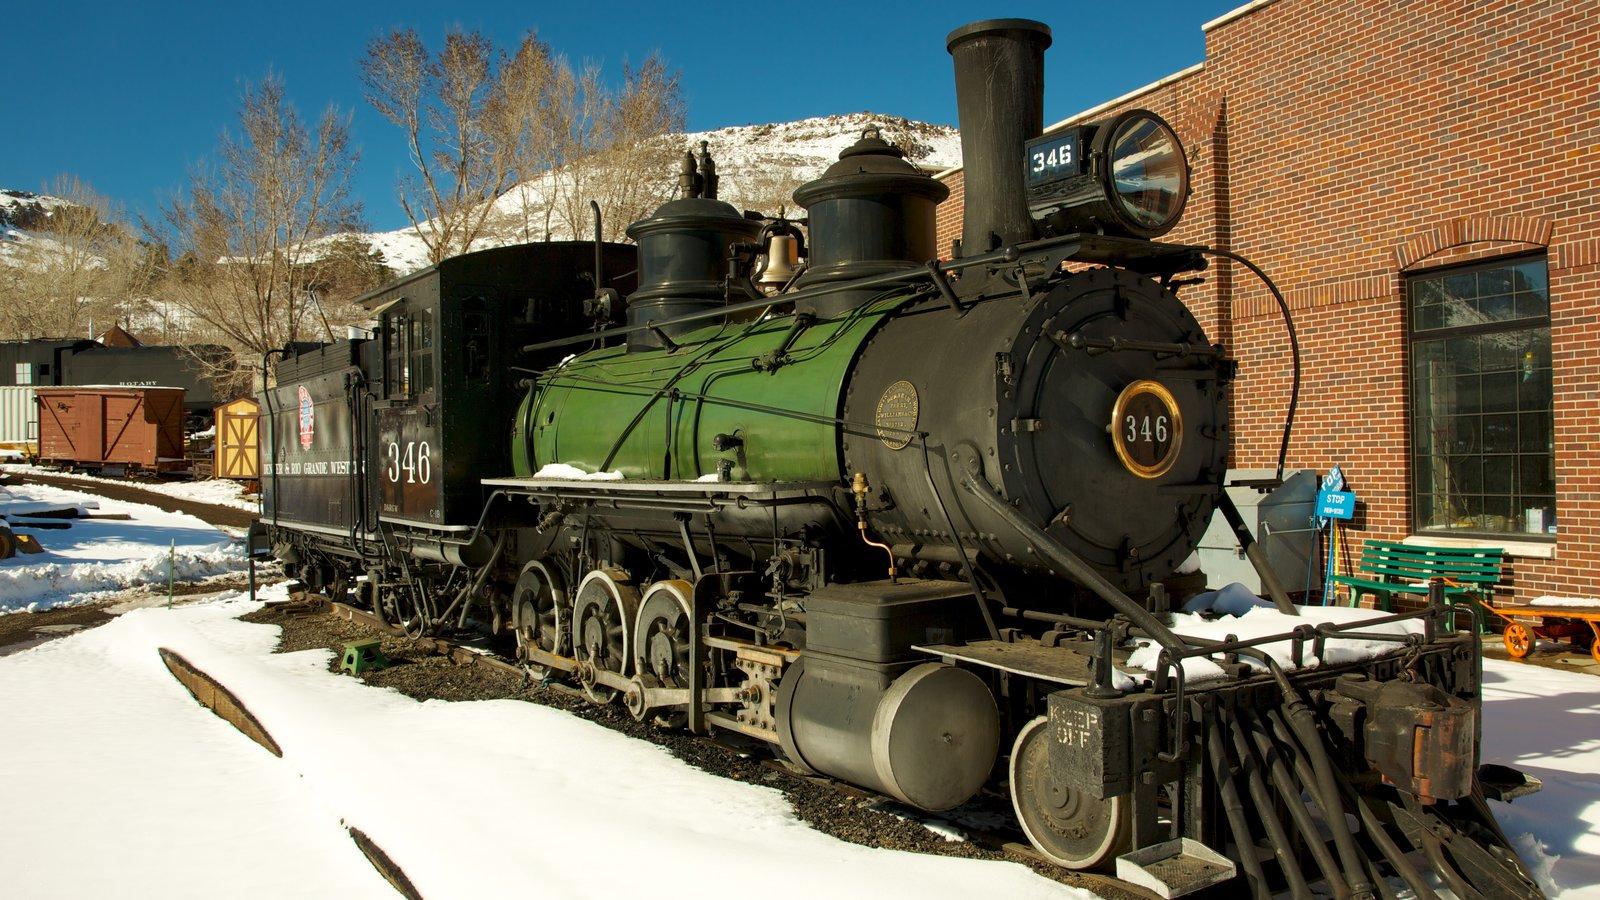 Golden caracterizando neve e itens de ferrovia